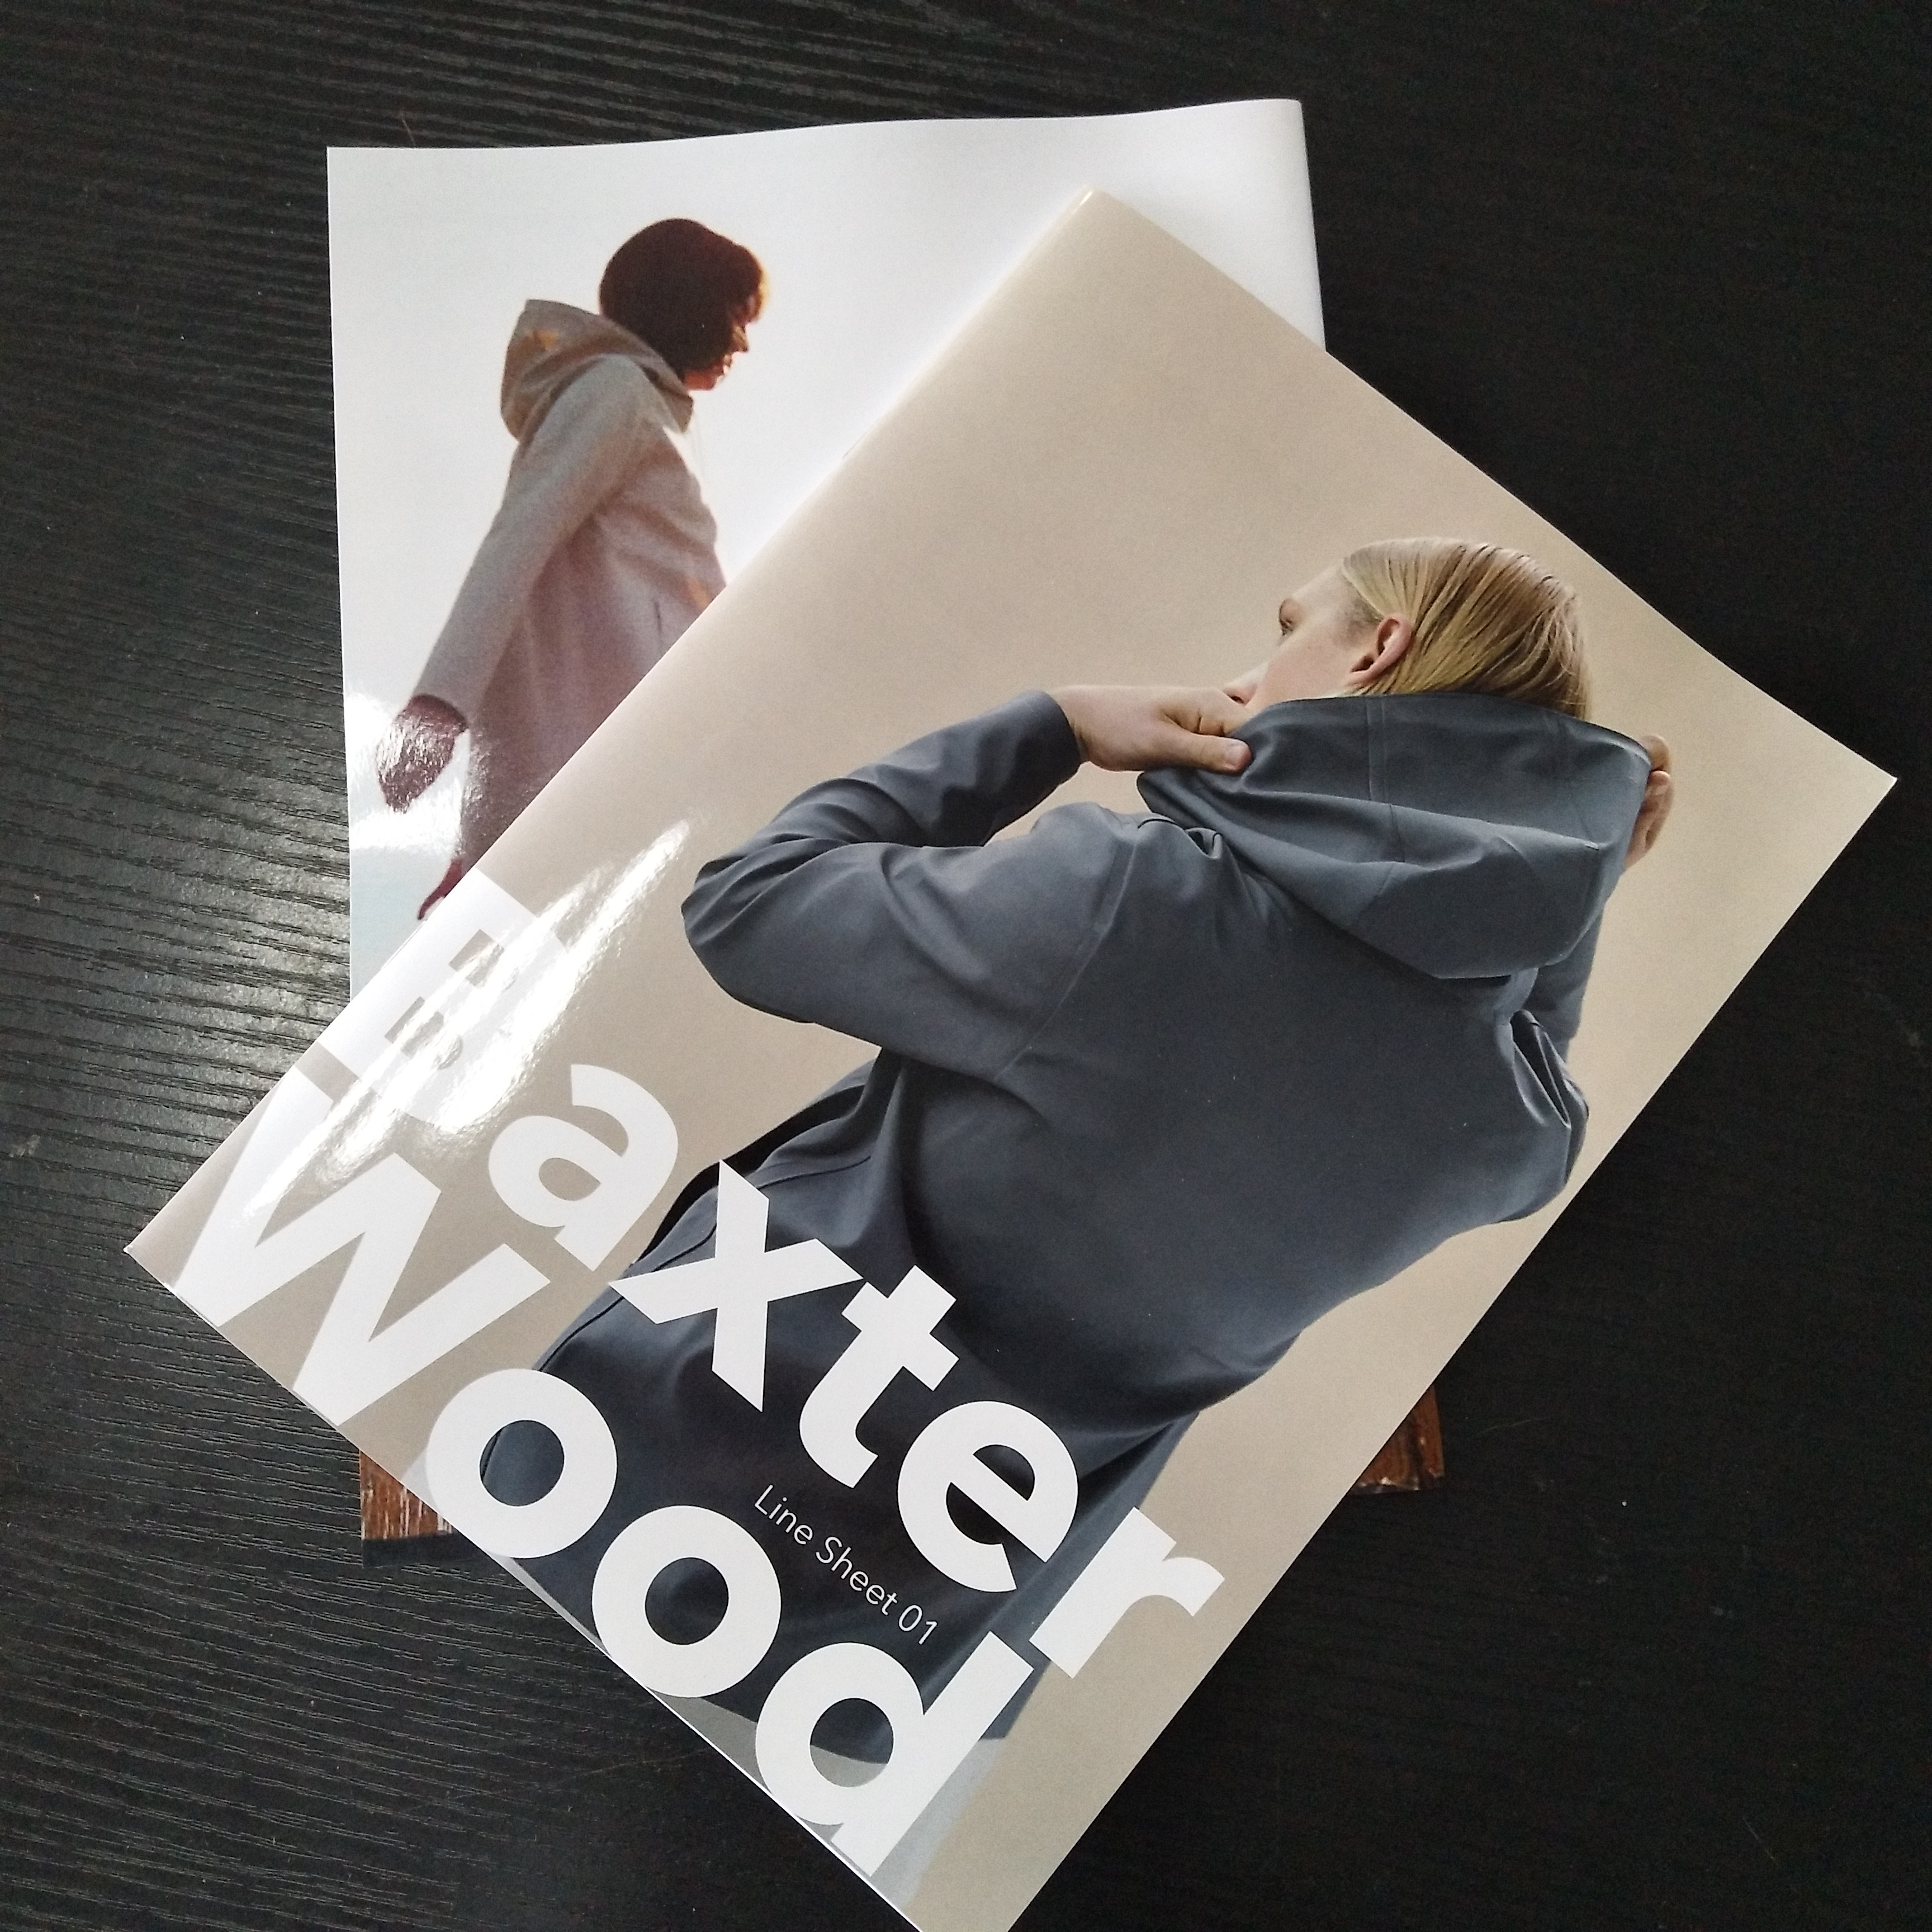 2020 Brochures & Catalogs & Instruction Books & Books booklets